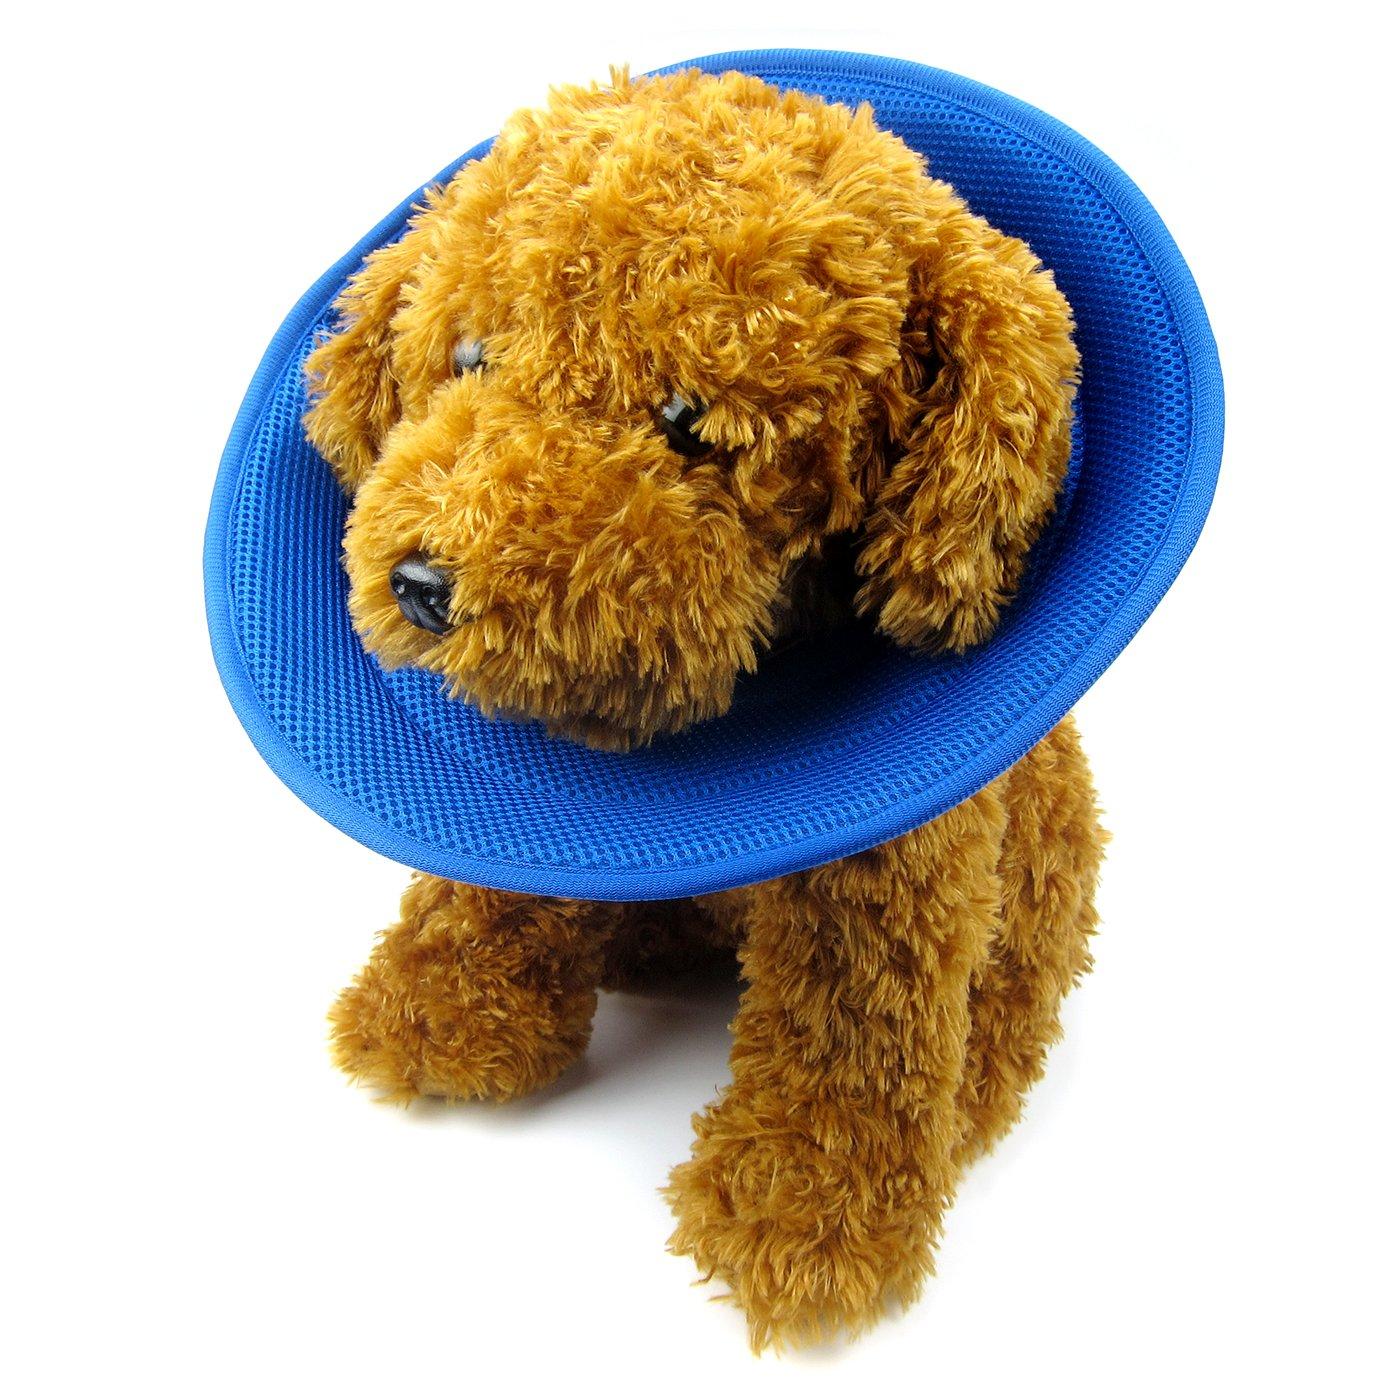 bluee Medium bluee Medium Alfie Pet Karter Recovery Collar for Dogs and Cats color  bluee, Size  Medium